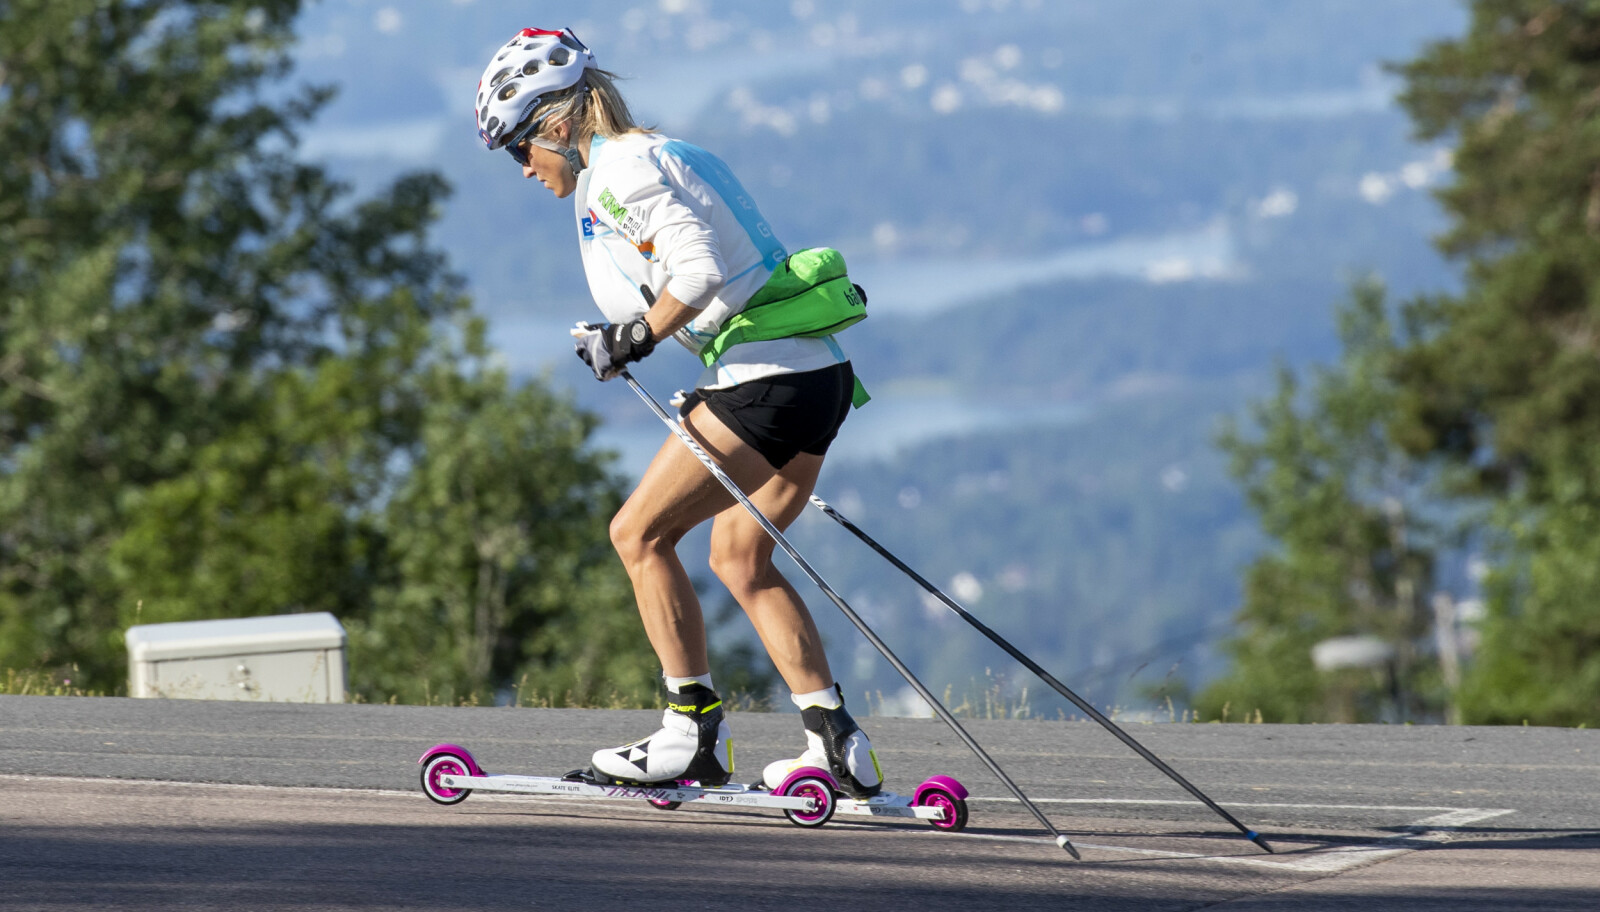 RULLESKI: Therese Johaug under en treningstur med rulleski i Holmenkollen sommeren 2020. FOTO: Terje Pedersen / NTB